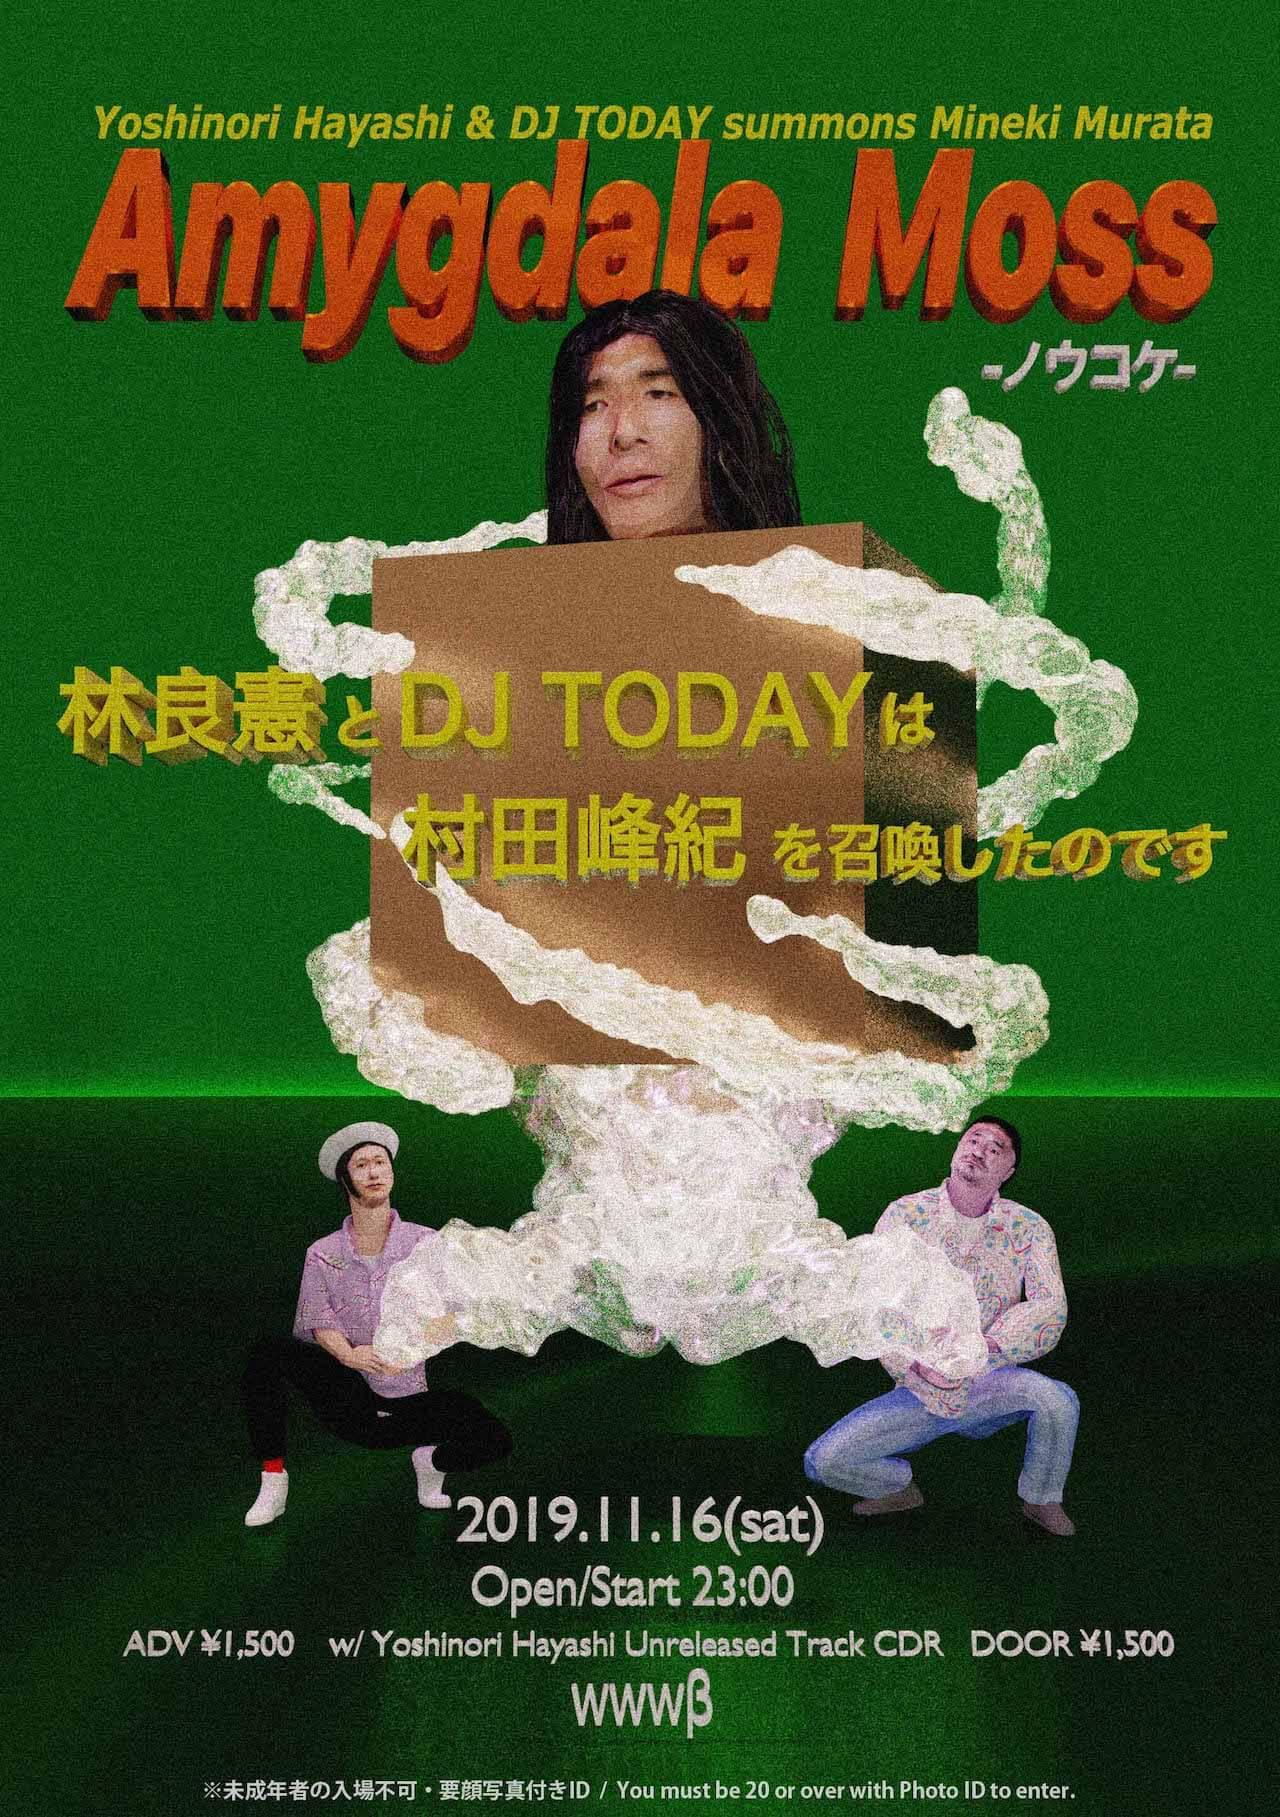 Yoshinori HayashiとDJ TODAYによるレジデントパーティーが美術家・村田峰紀を召喚し11月に開催 music191010-amygdala-moss-1